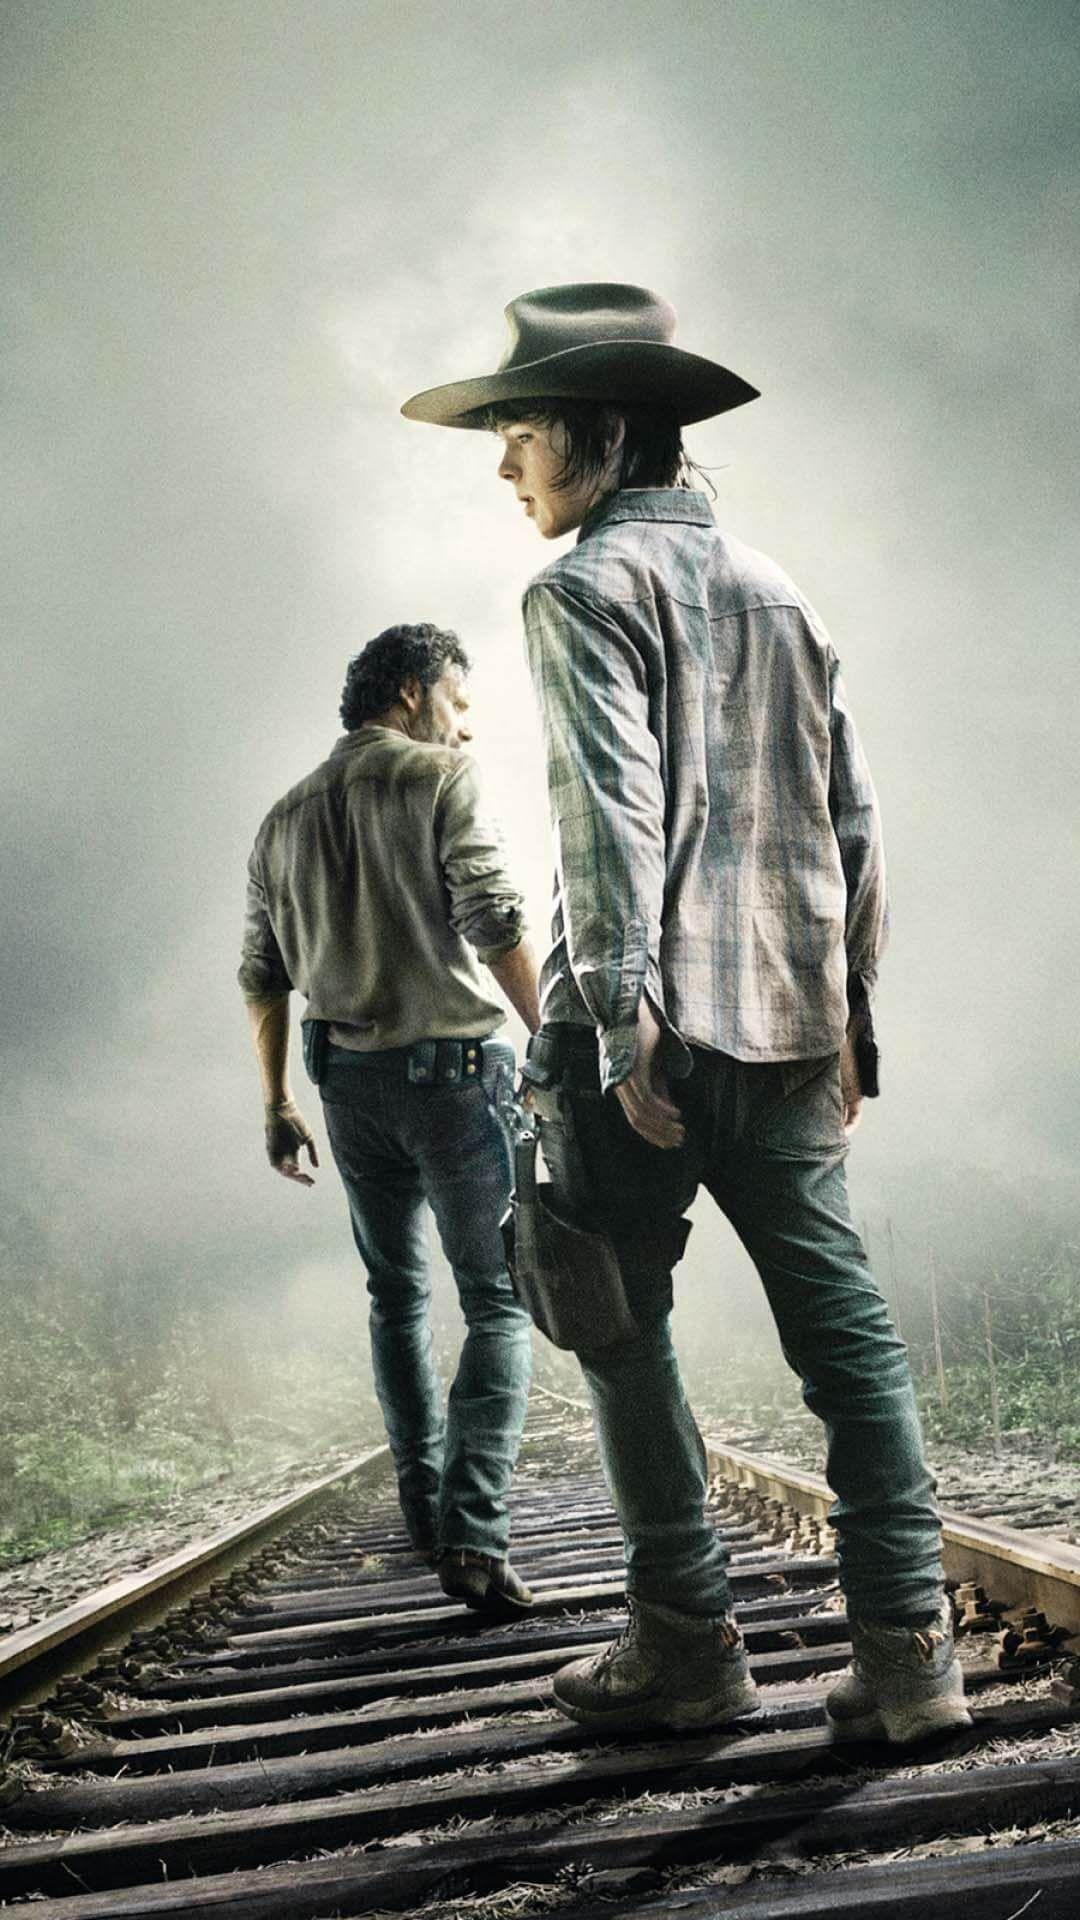 Fonds D Ecran Iphone Serie Tv The Walking Dead 01 Fond D Ecran Film The Walking Dead Film Horreur